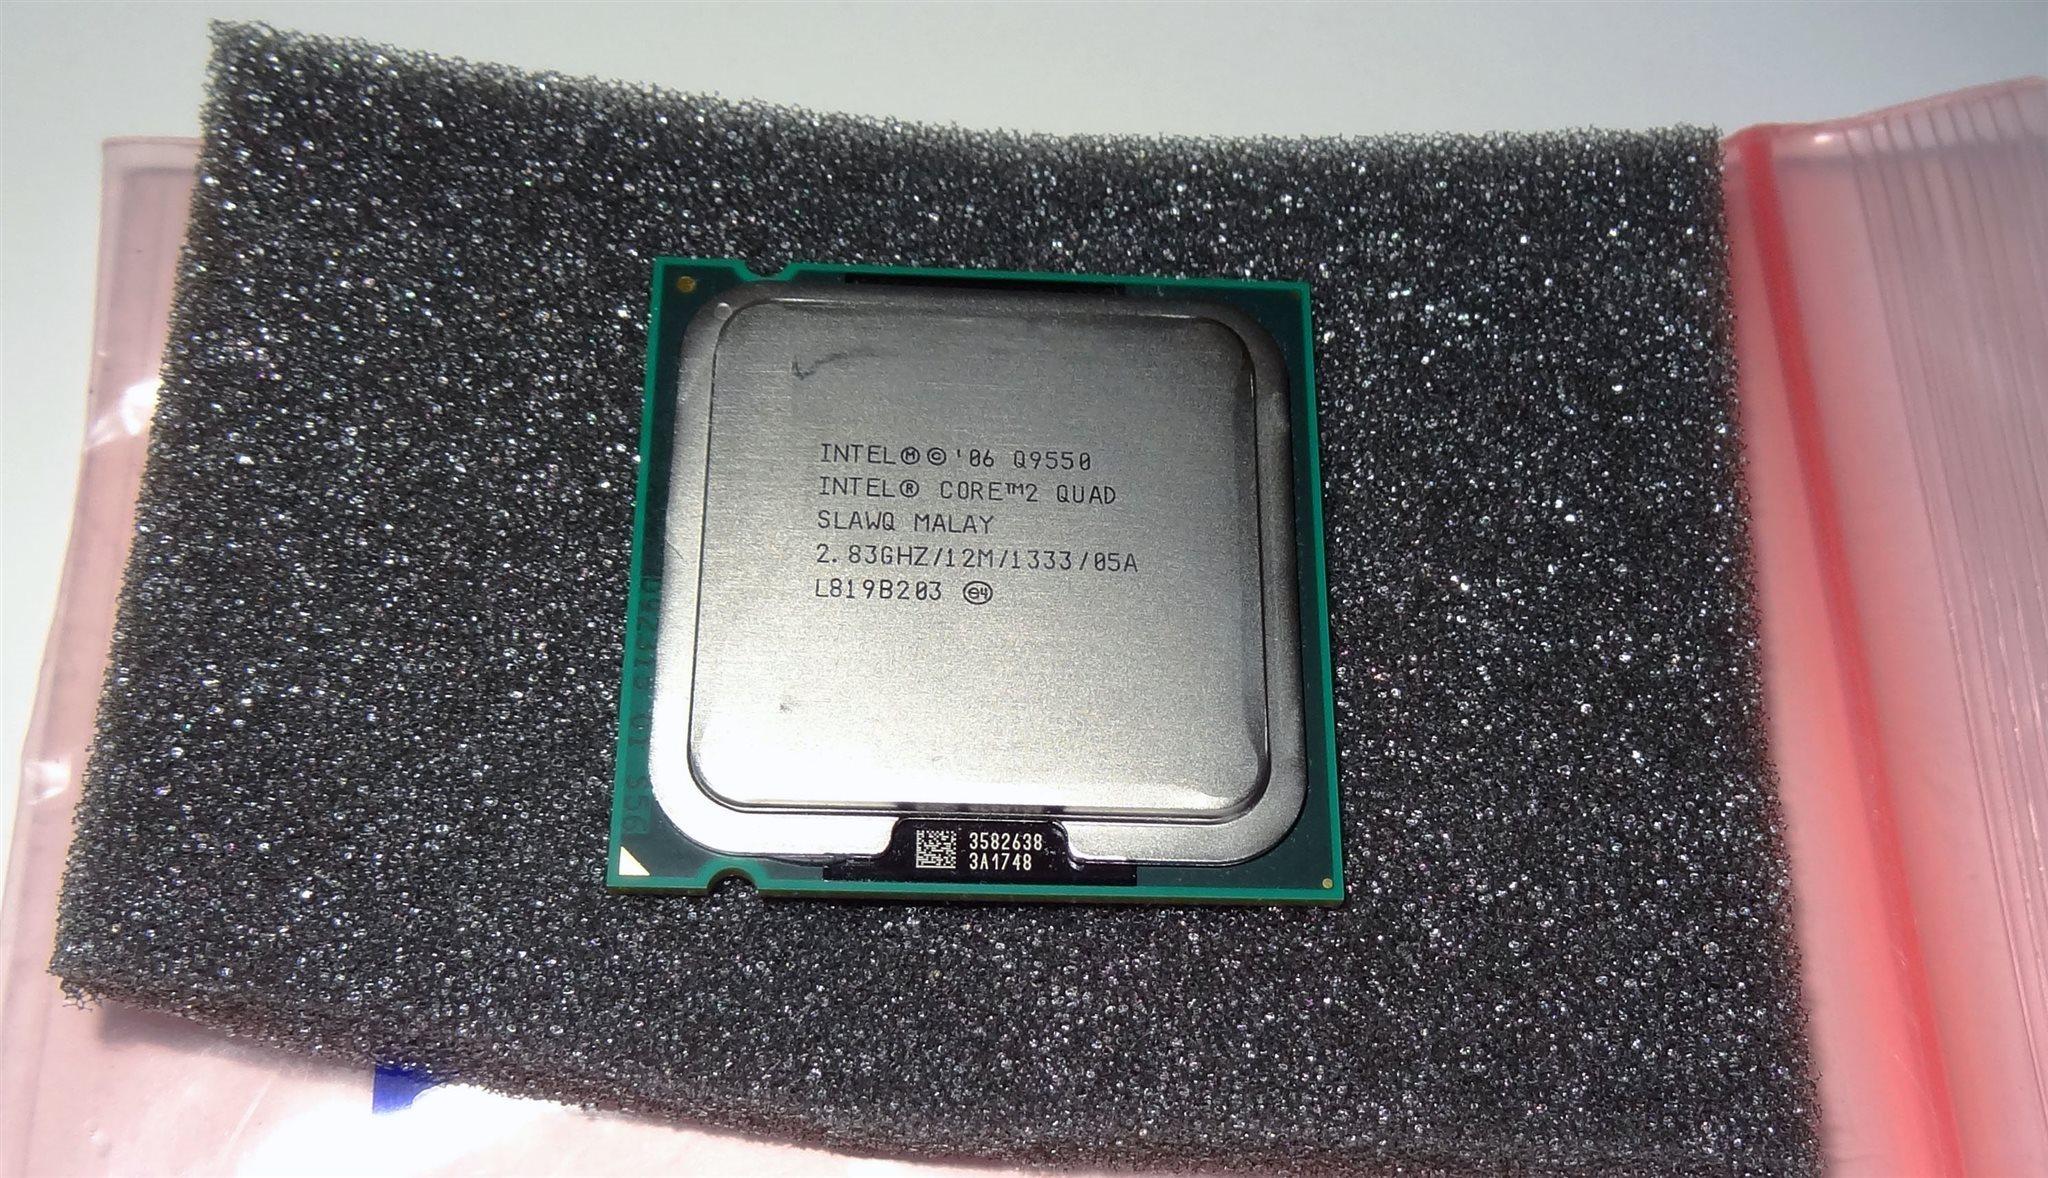 Intel Core 2 Quad Processor Q9550 12m Cache 319449777 Kp Q 9550 283 Ghz 1333 Mhz Fsb